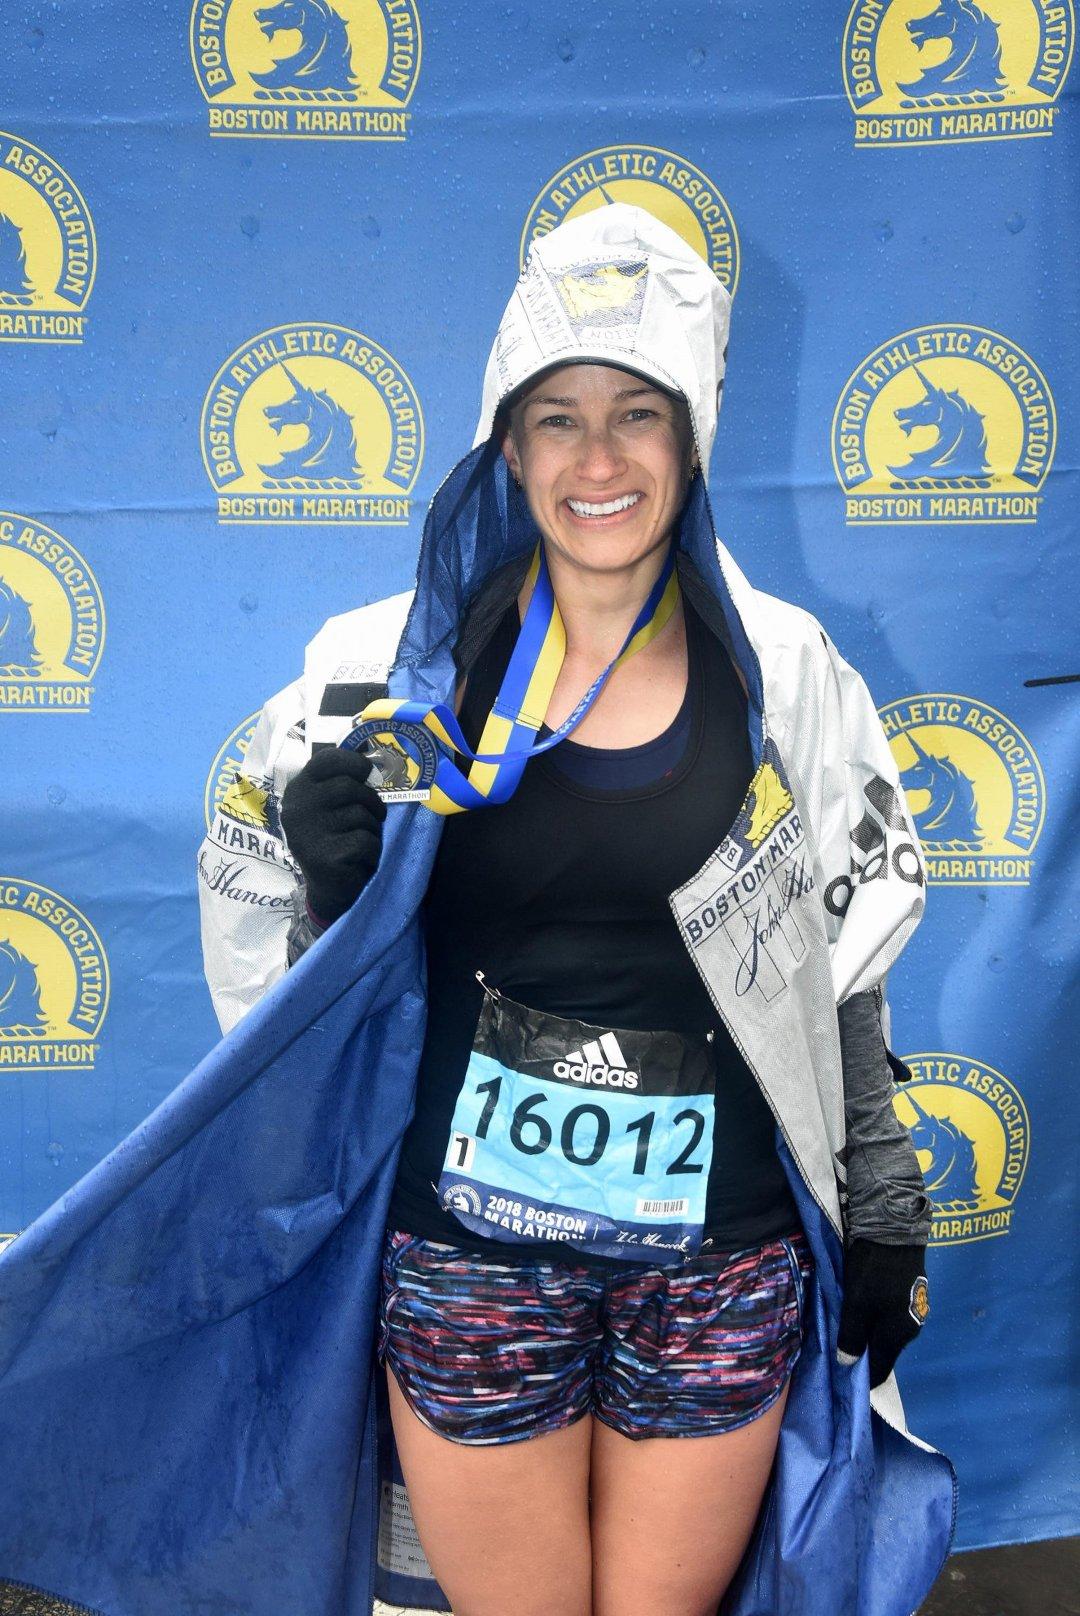 boston-marathon-2018-medals